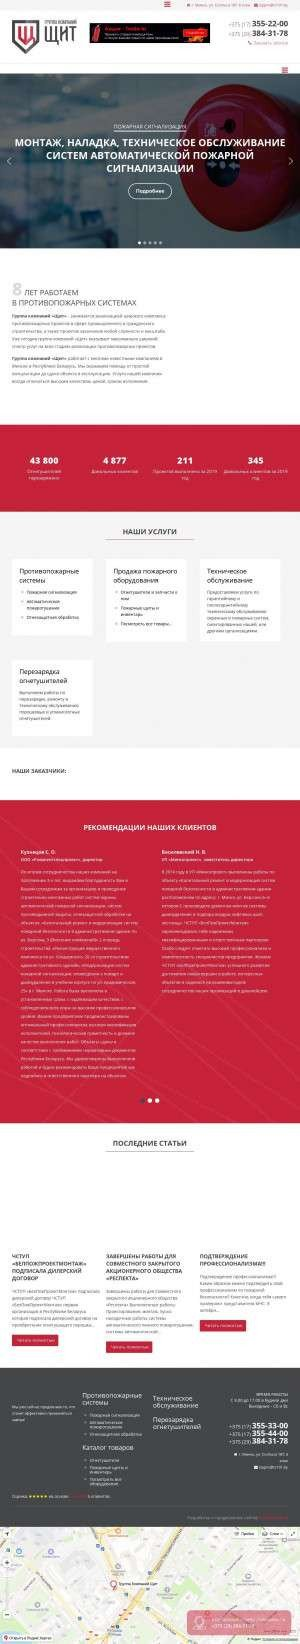 Предпросмотр для tc101.by — Щит